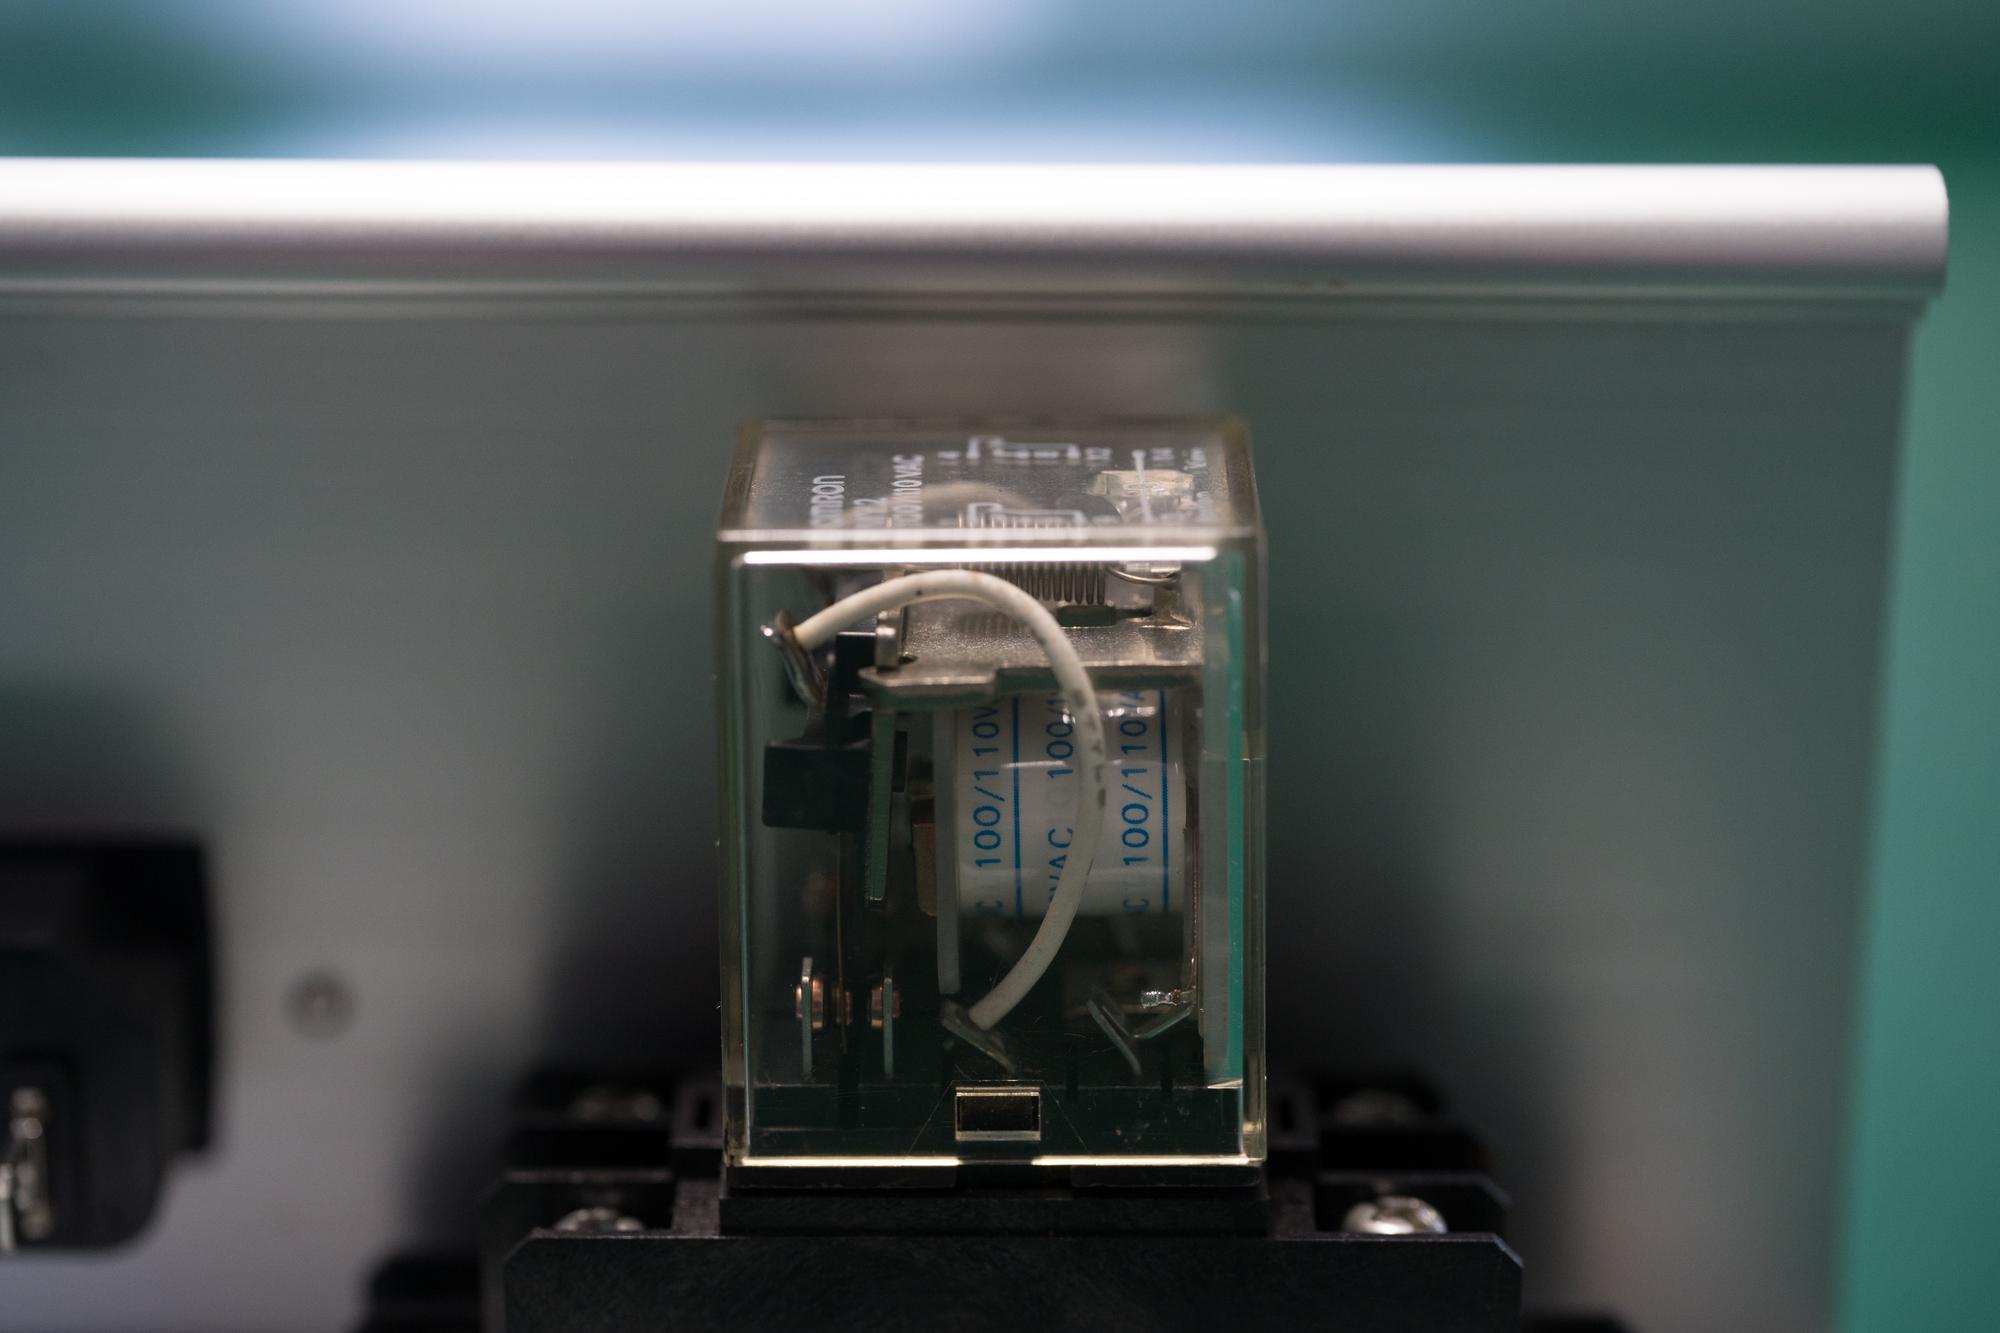 FA機器メーカー向け、防爆構造光電センサ接続用リレー用基板実装、完成品組立